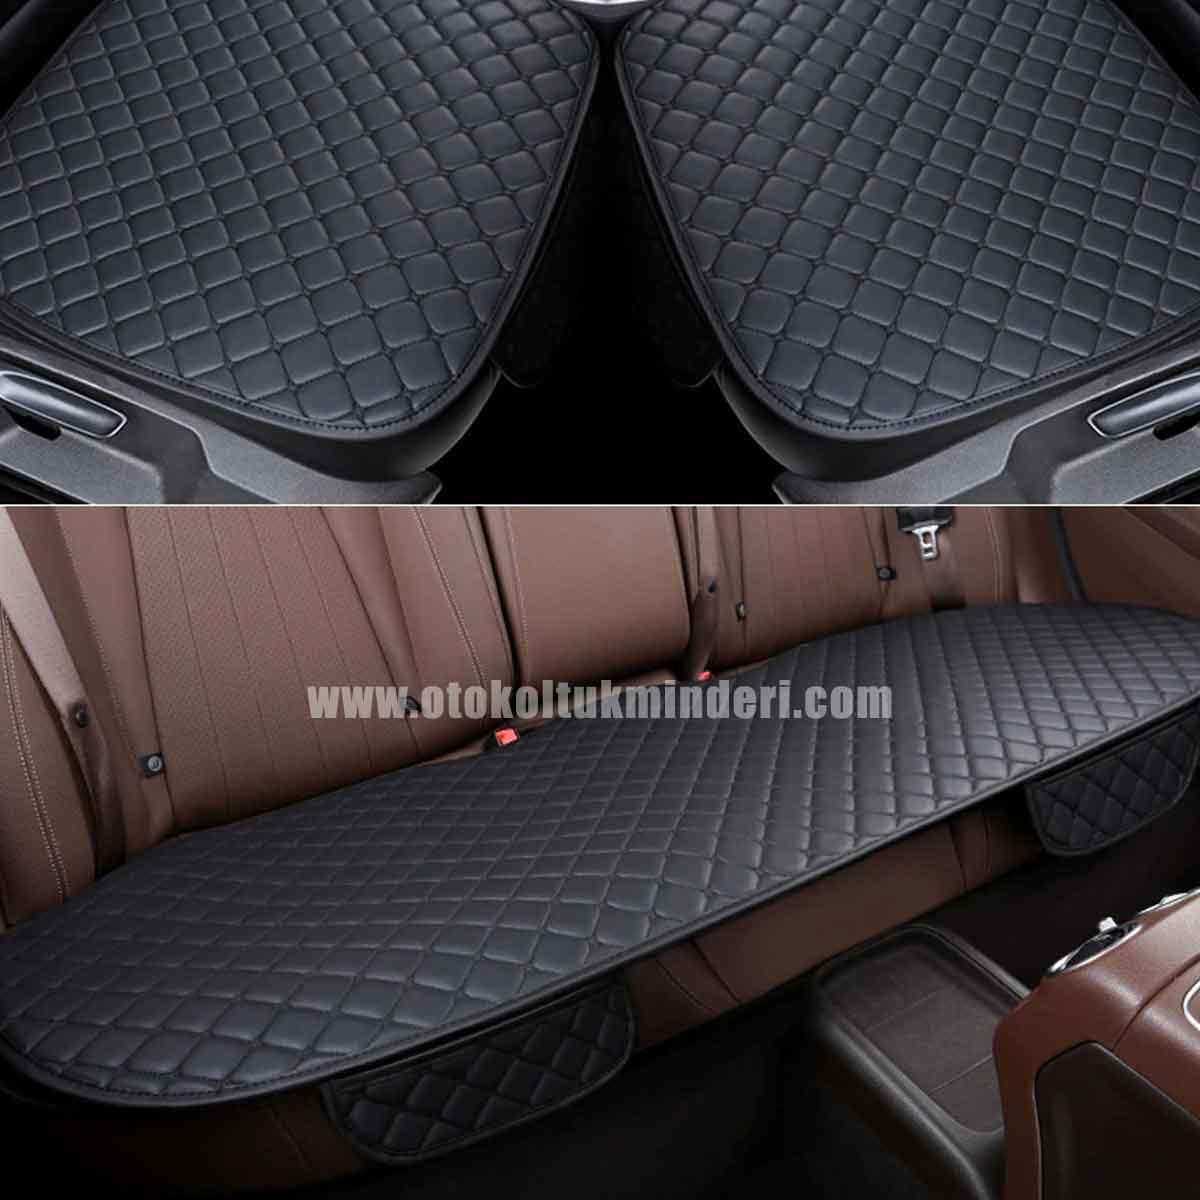 Hyundai koltuk kılıfı deri - Hyundai Koltuk minderi Siyah Deri Cepli